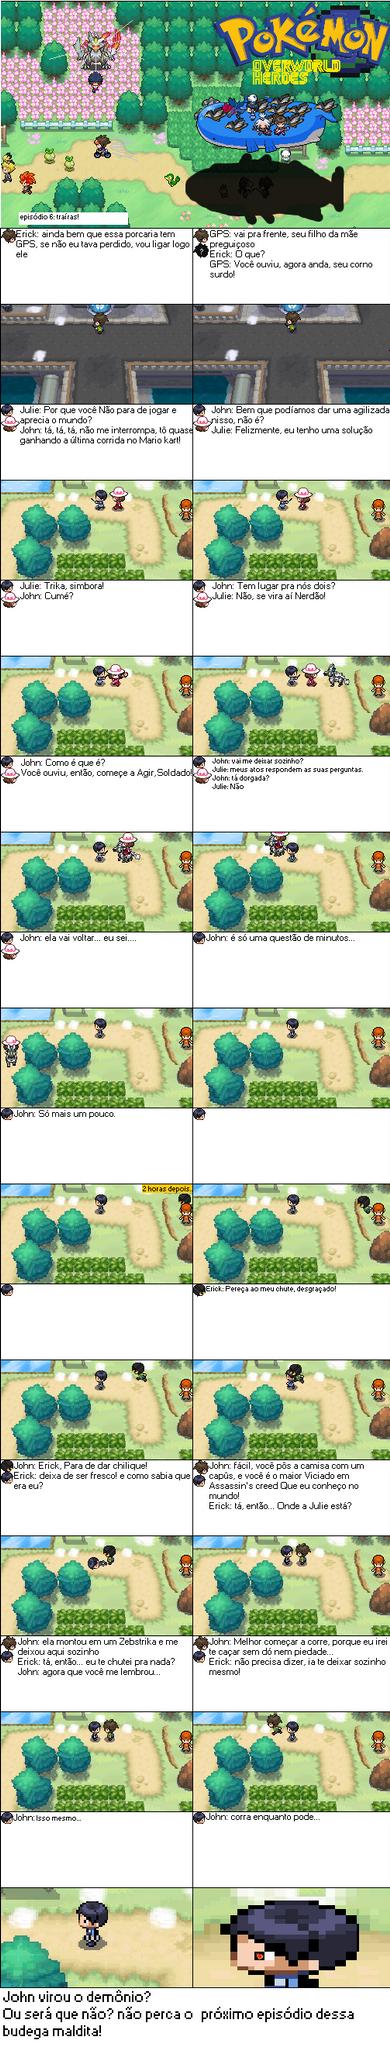 Pokemon Overworld heroes #6 Traidores! by Erick8530